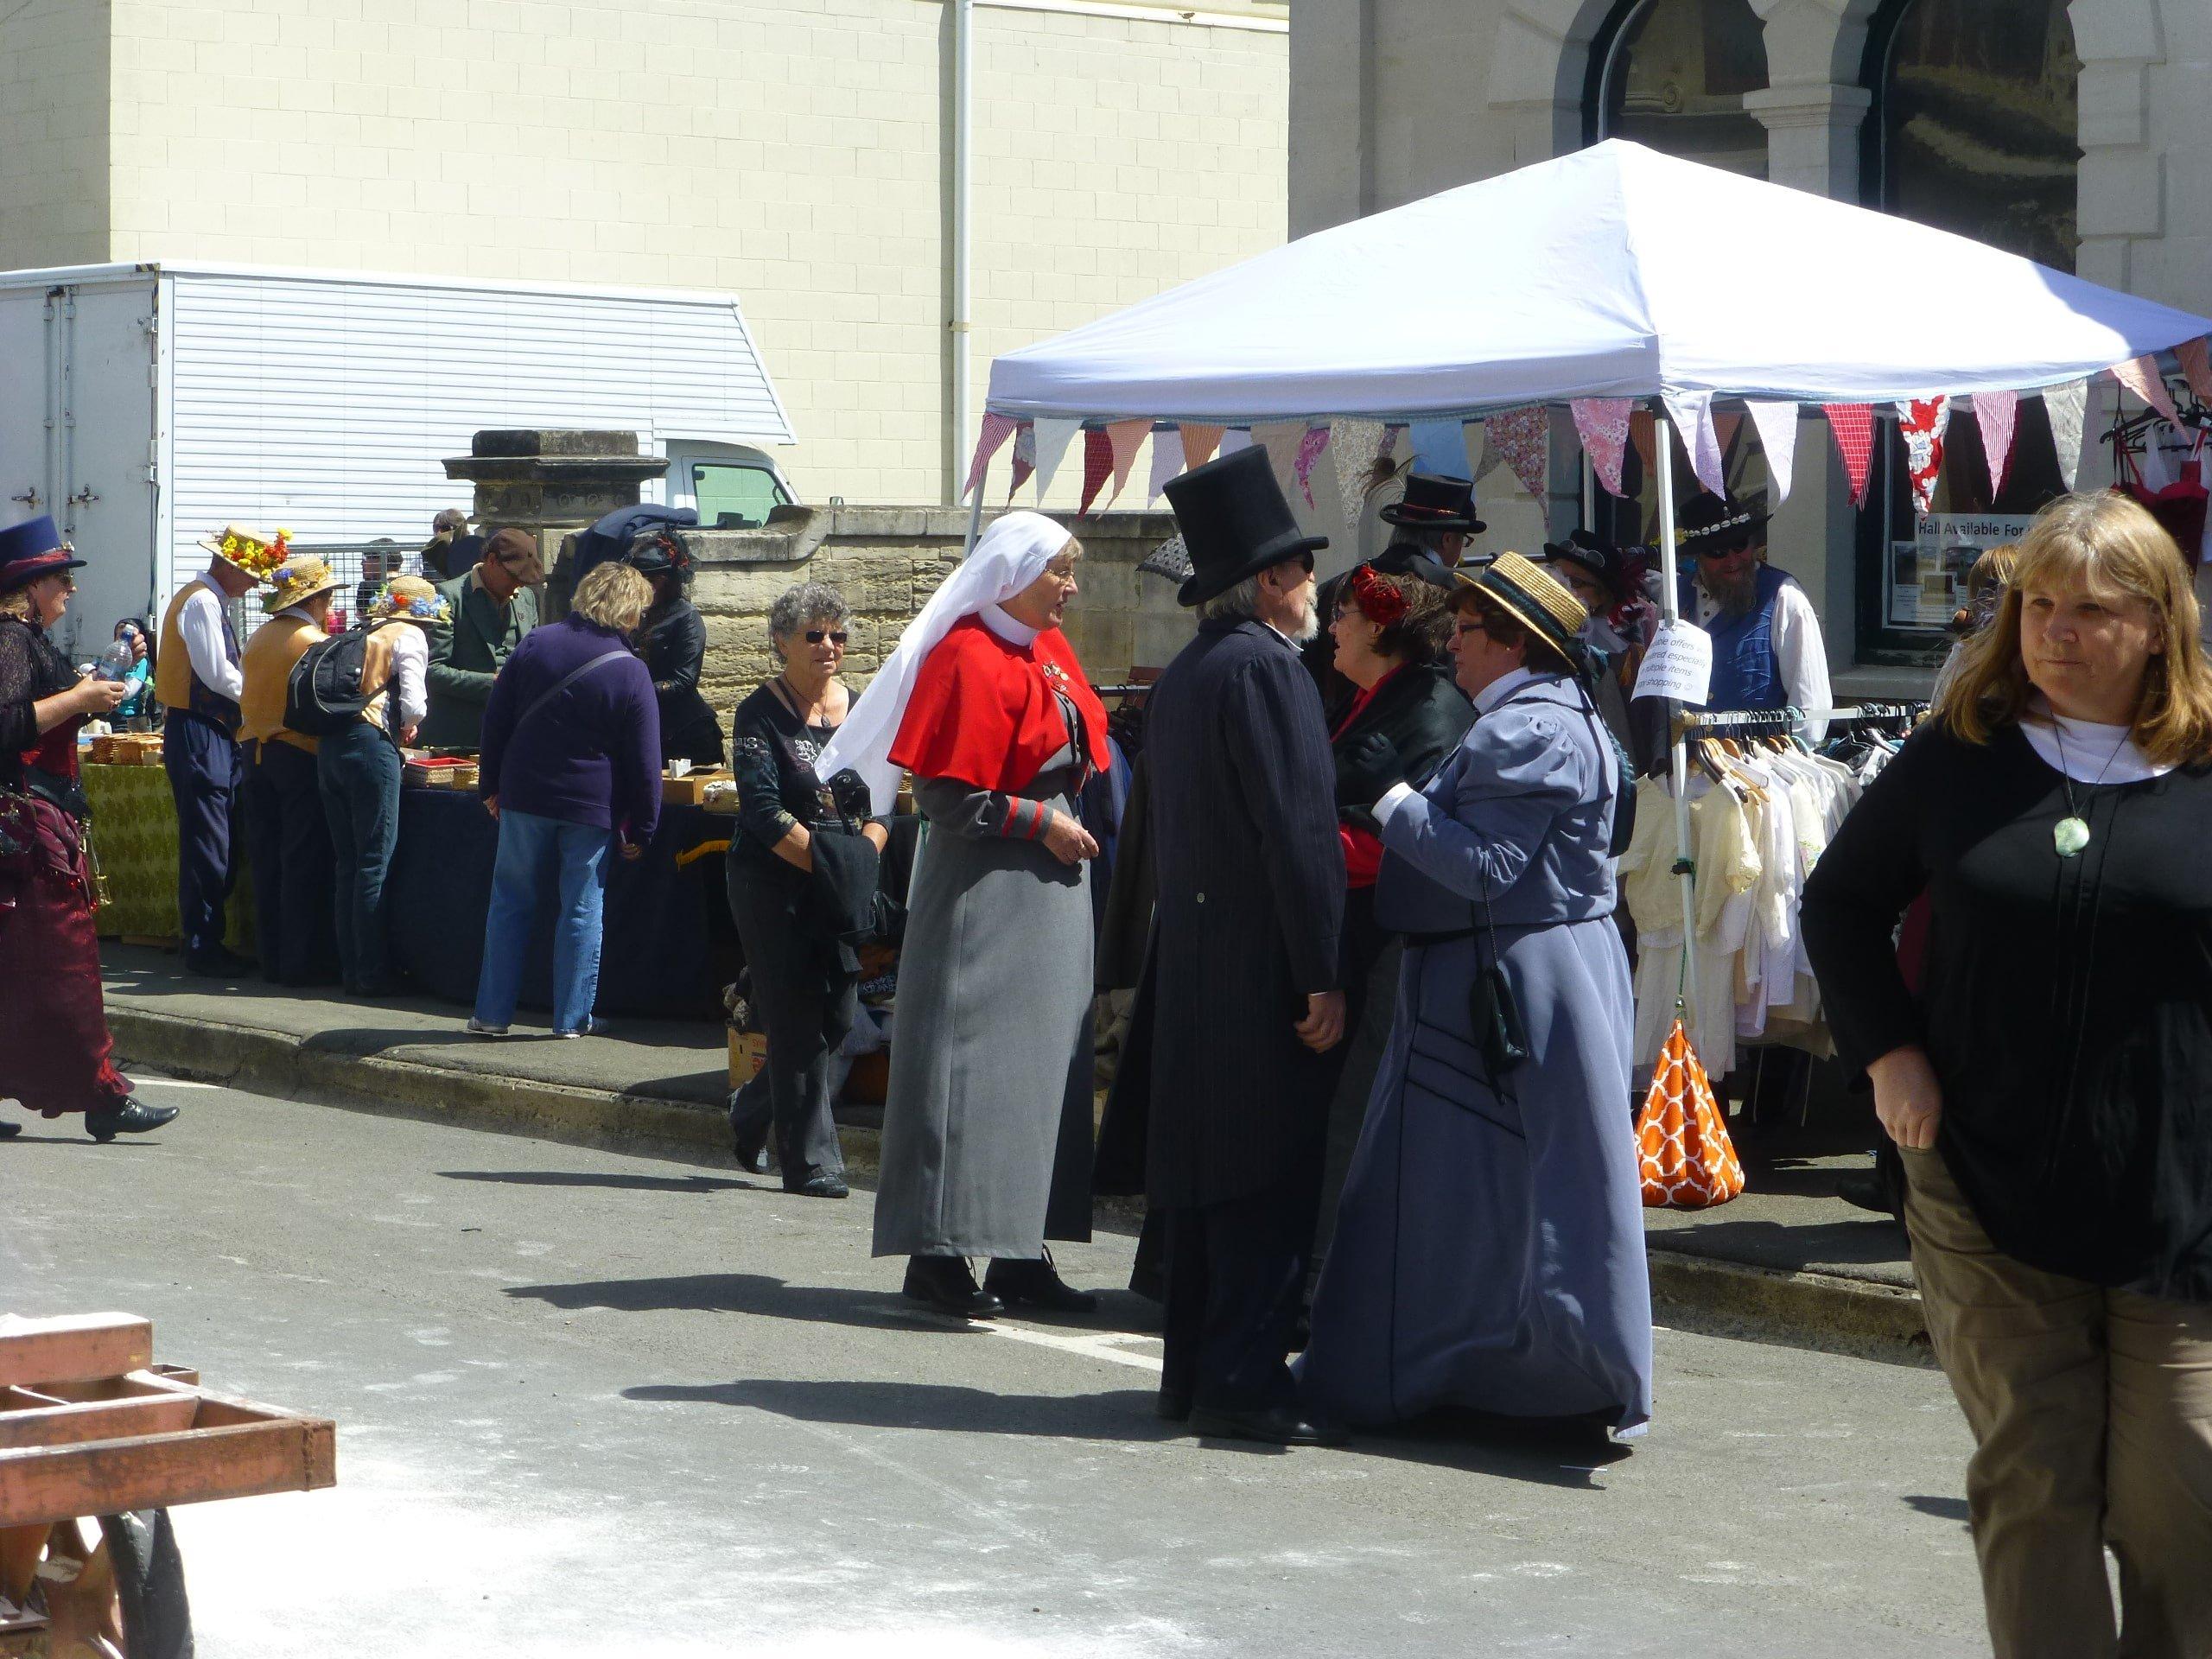 Viktorian Festival in Oamaru 26